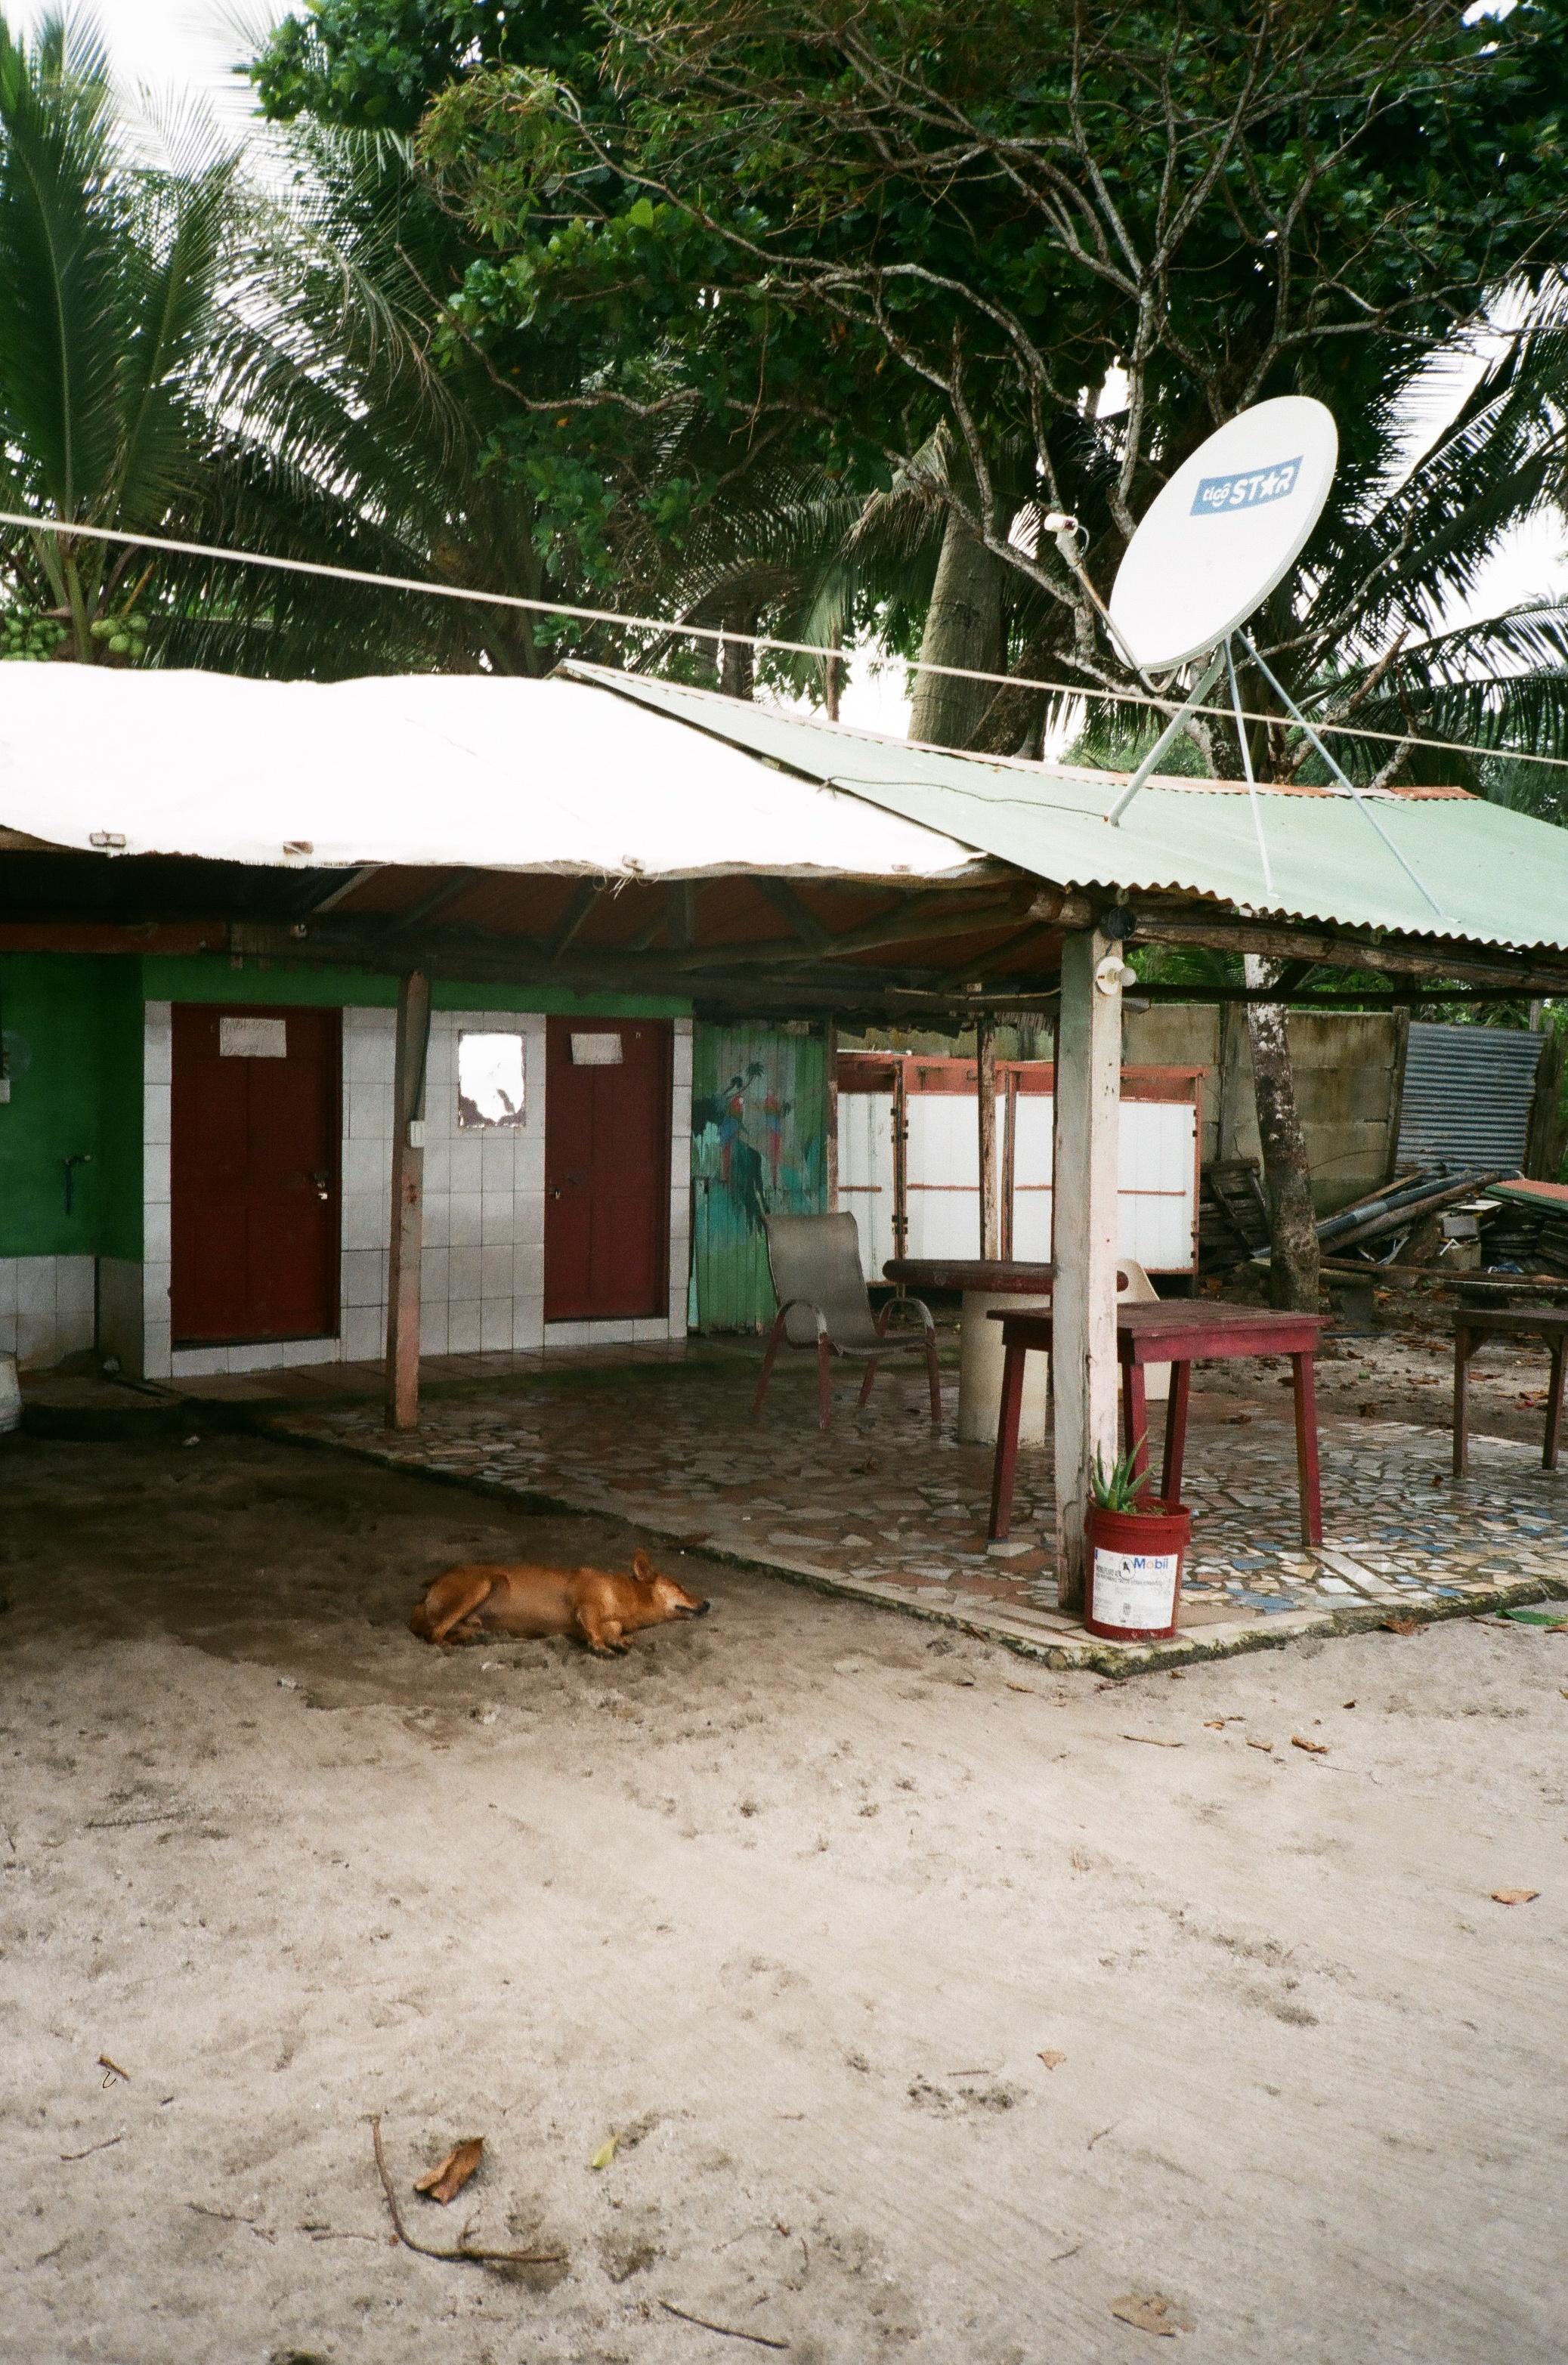 Esterillos Centro, Puntarenas Province, Costa Rica